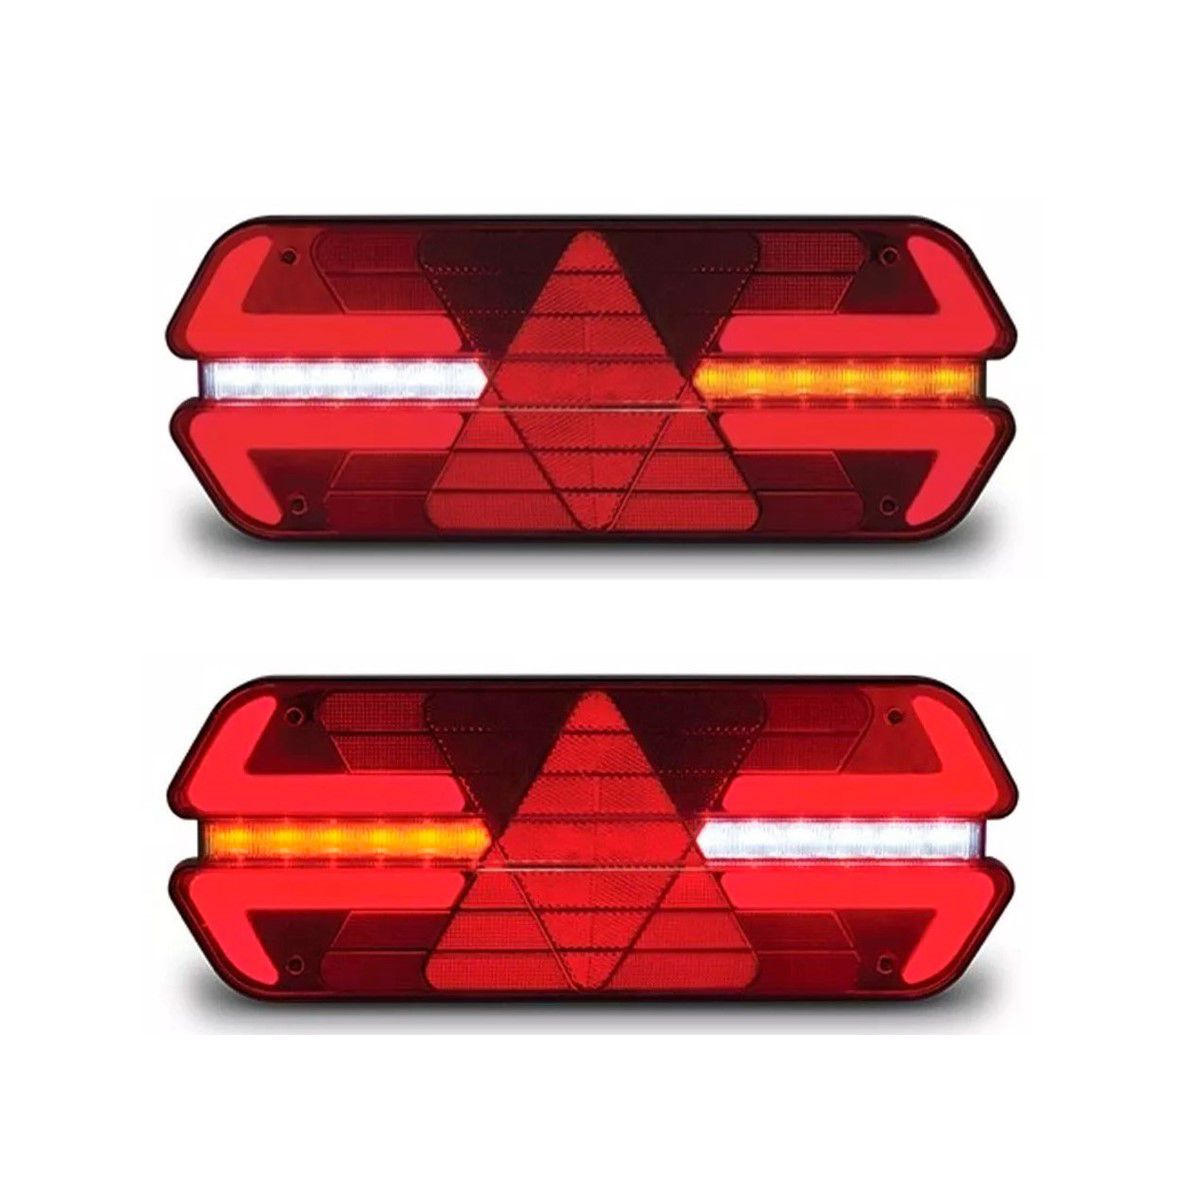 PAR LANTERNA TRASEIRA LED TRIPLO X - PRADOLUX - 24V - VERMELHA